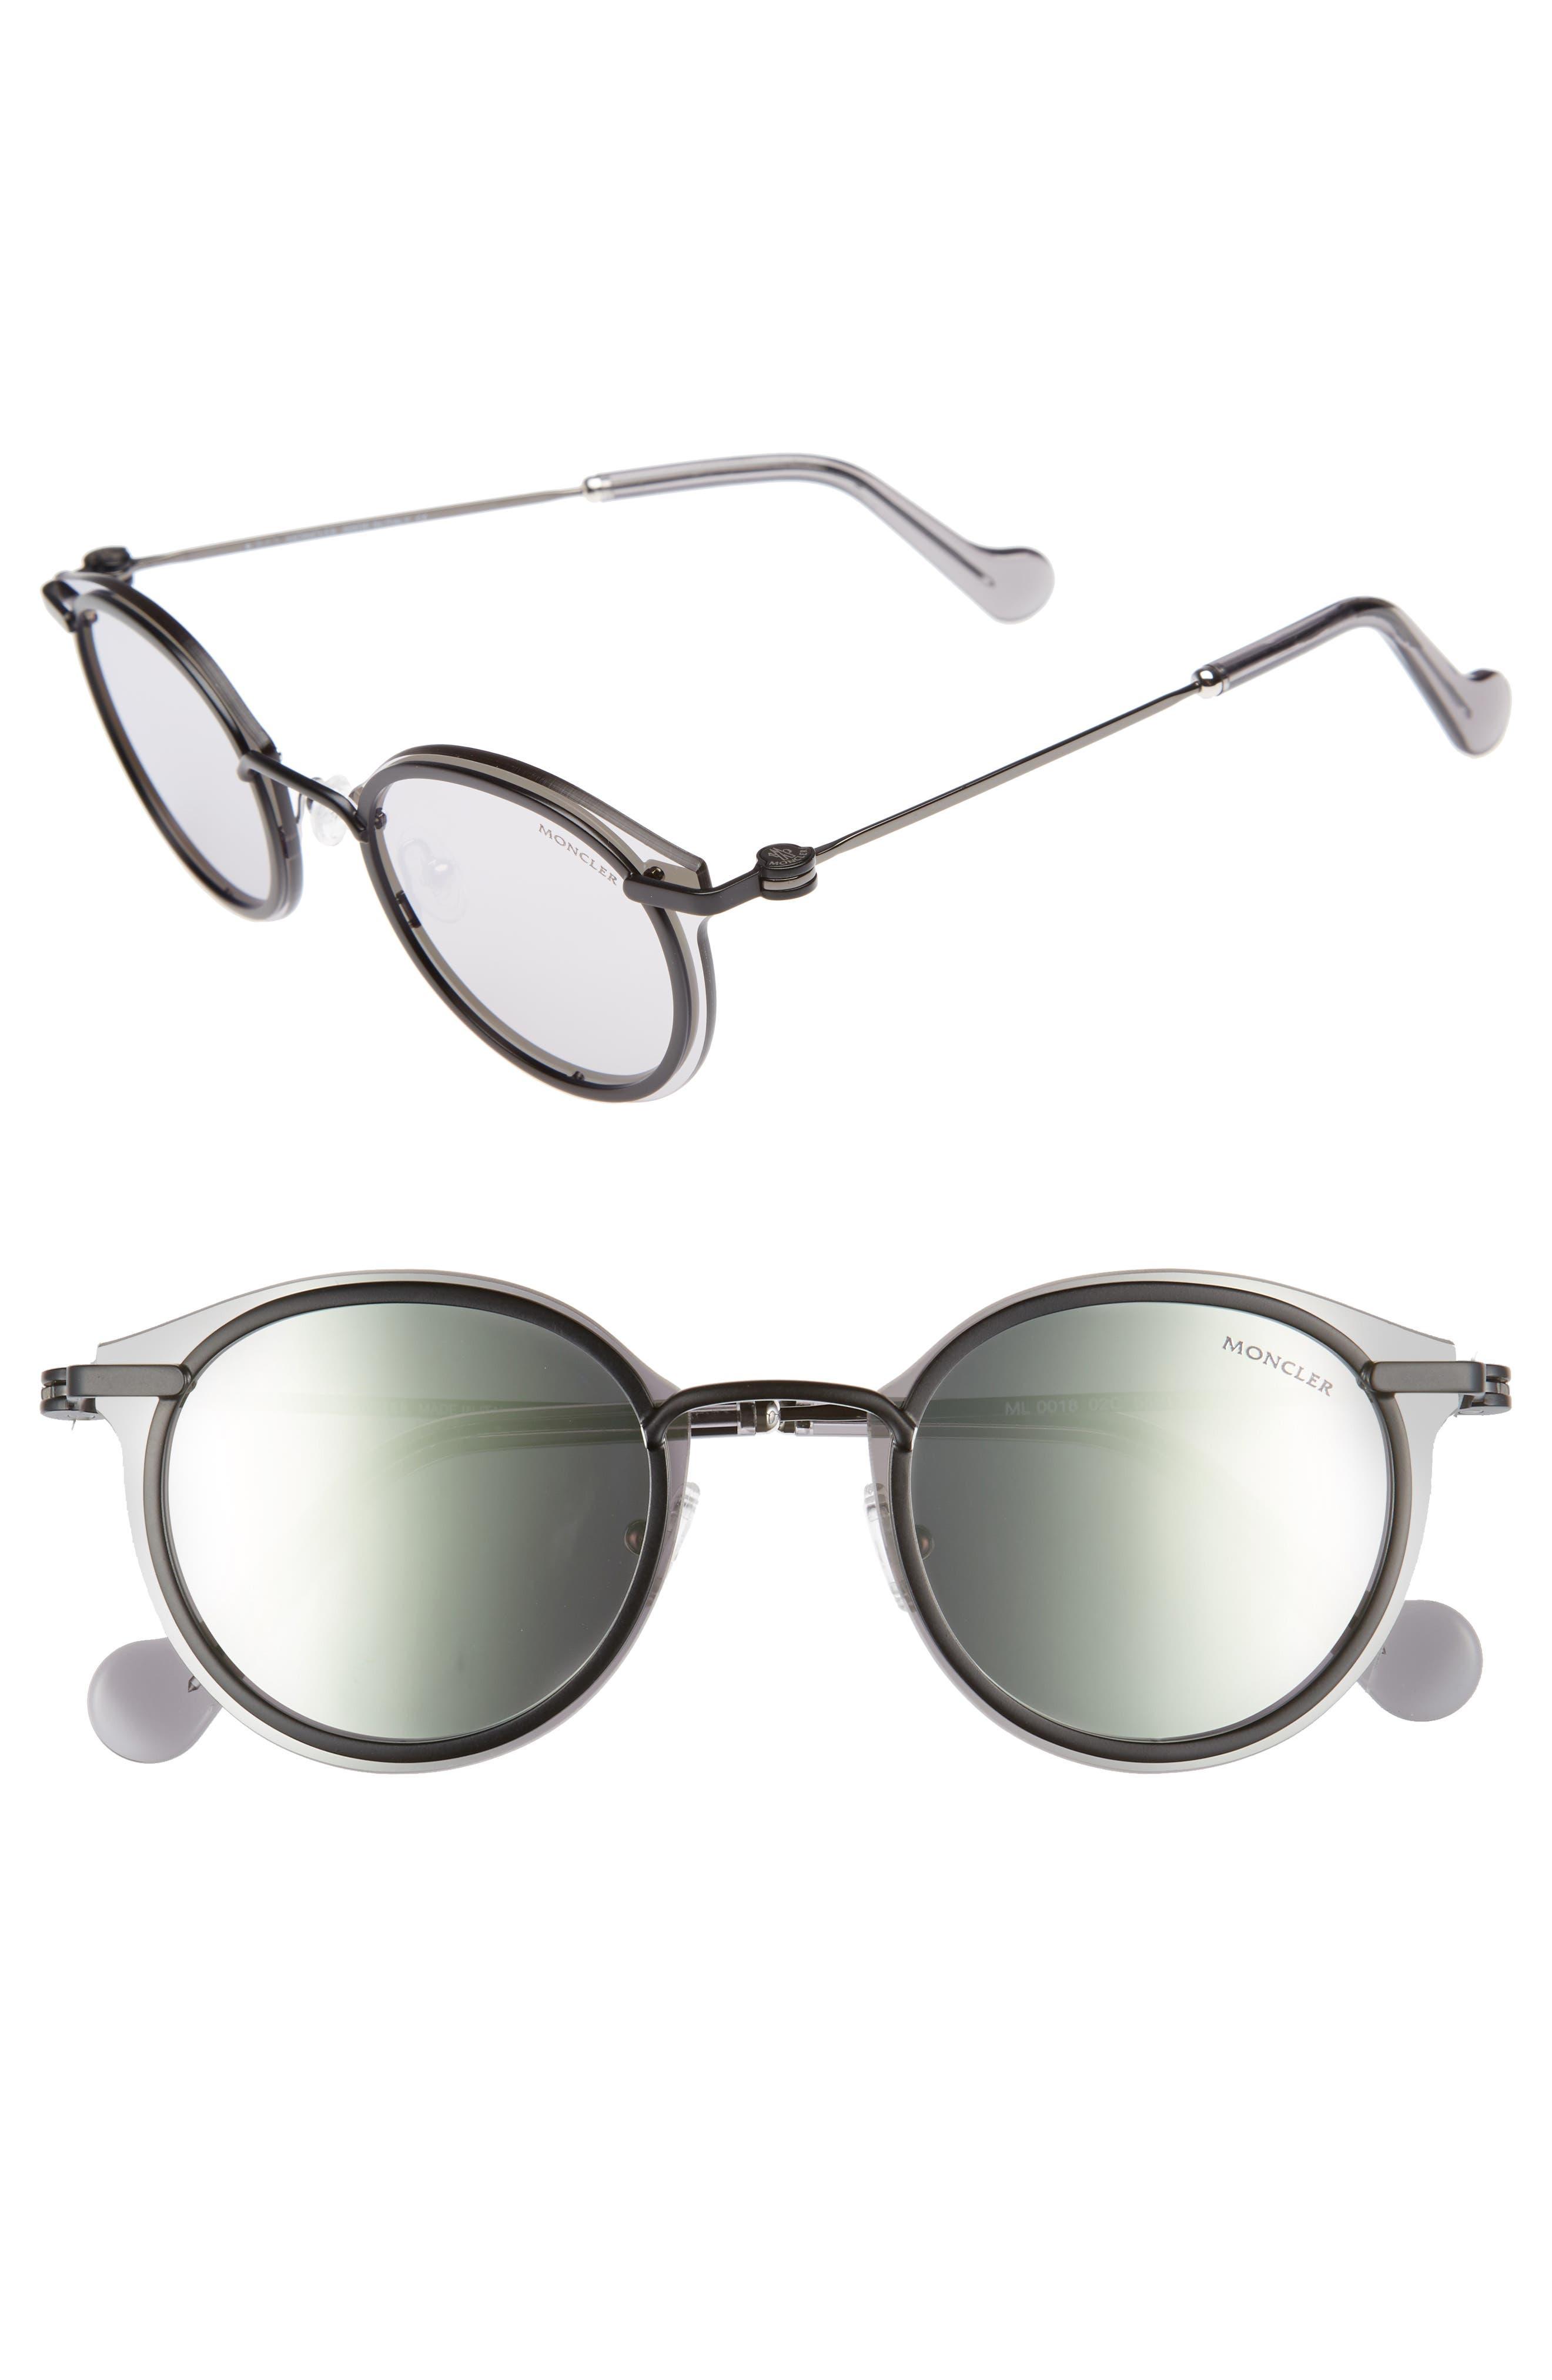 58mm Mirrored Round Sunglasses,                         Main,                         color, 001